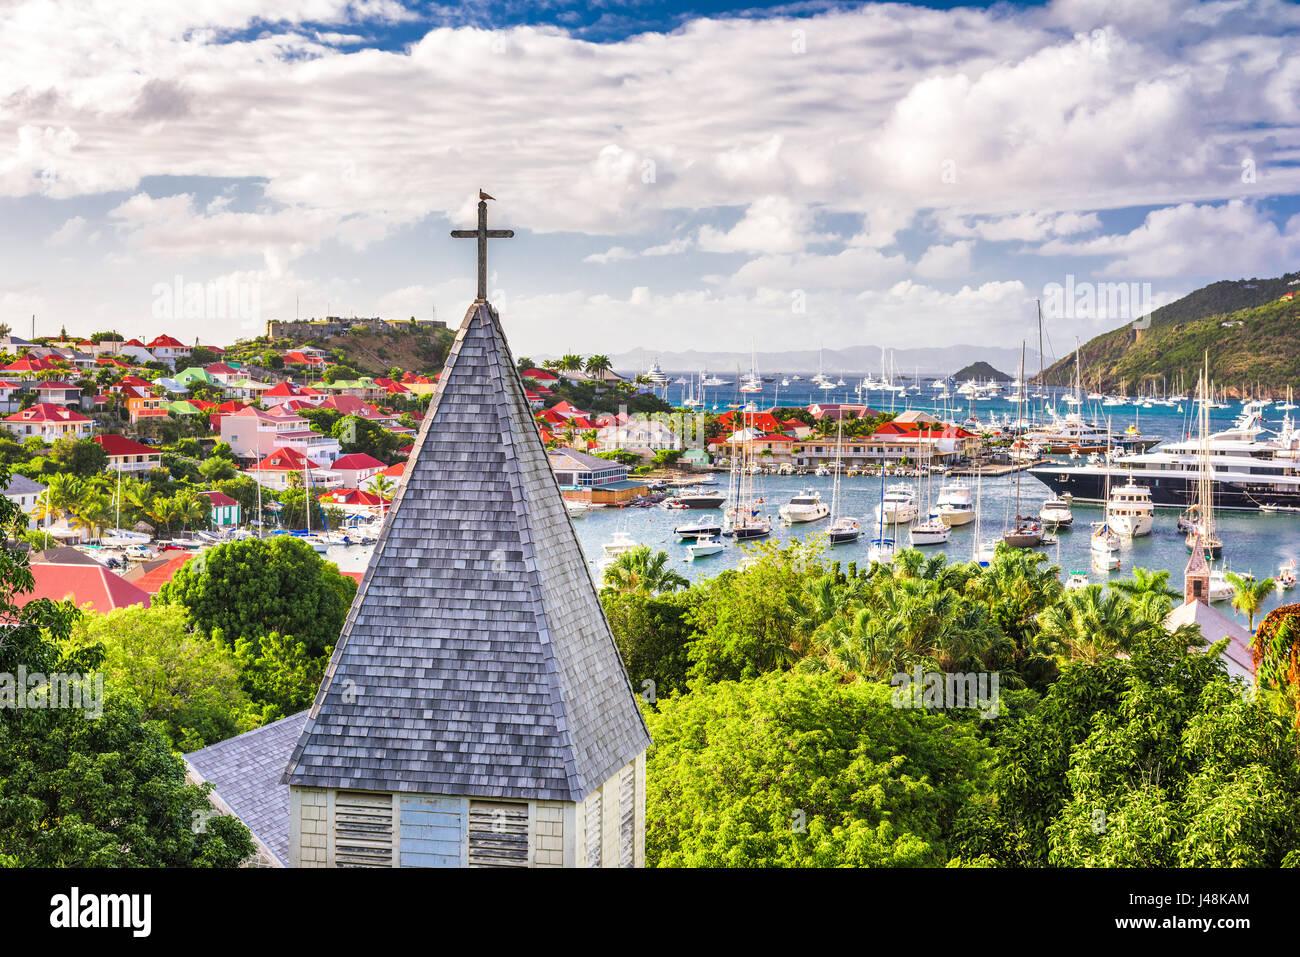 Saint Barthelemy Caribe Saint Barthelemy vista desde detrás de la Iglesia Anglicana. Foto de stock